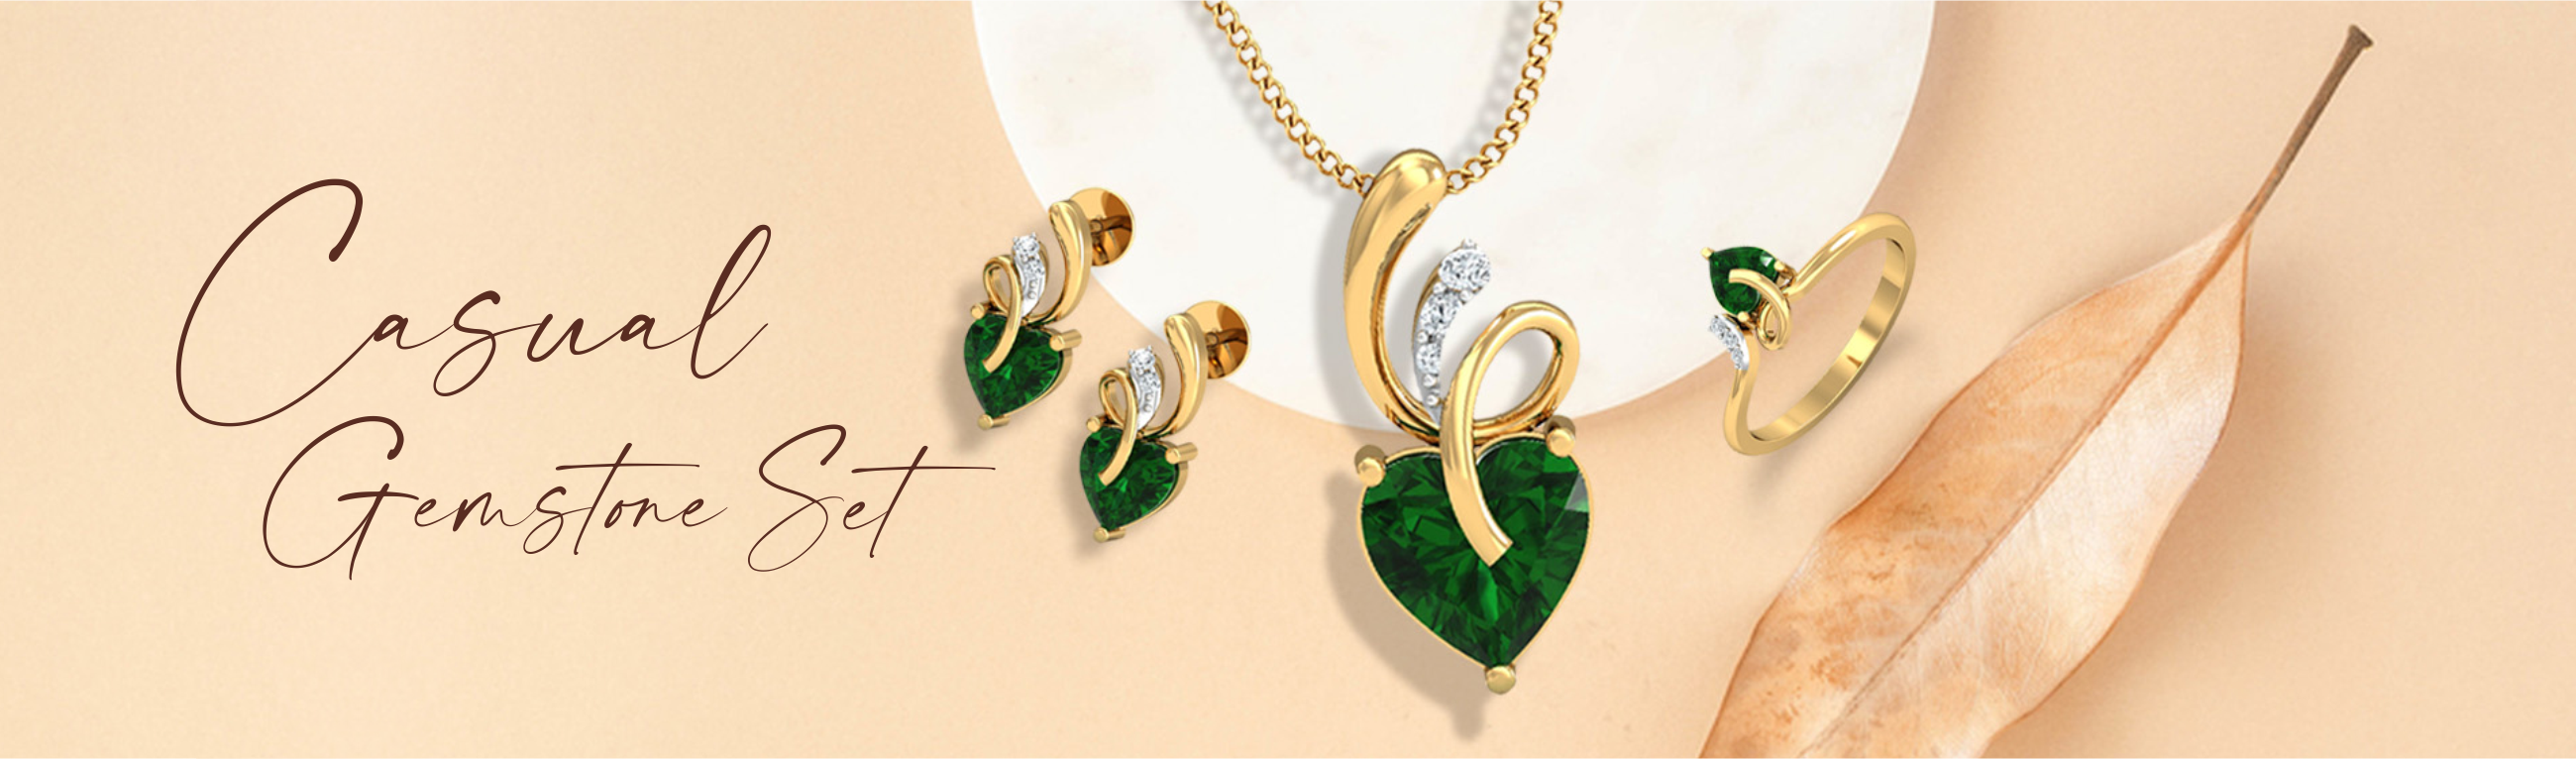 casual gemstone set